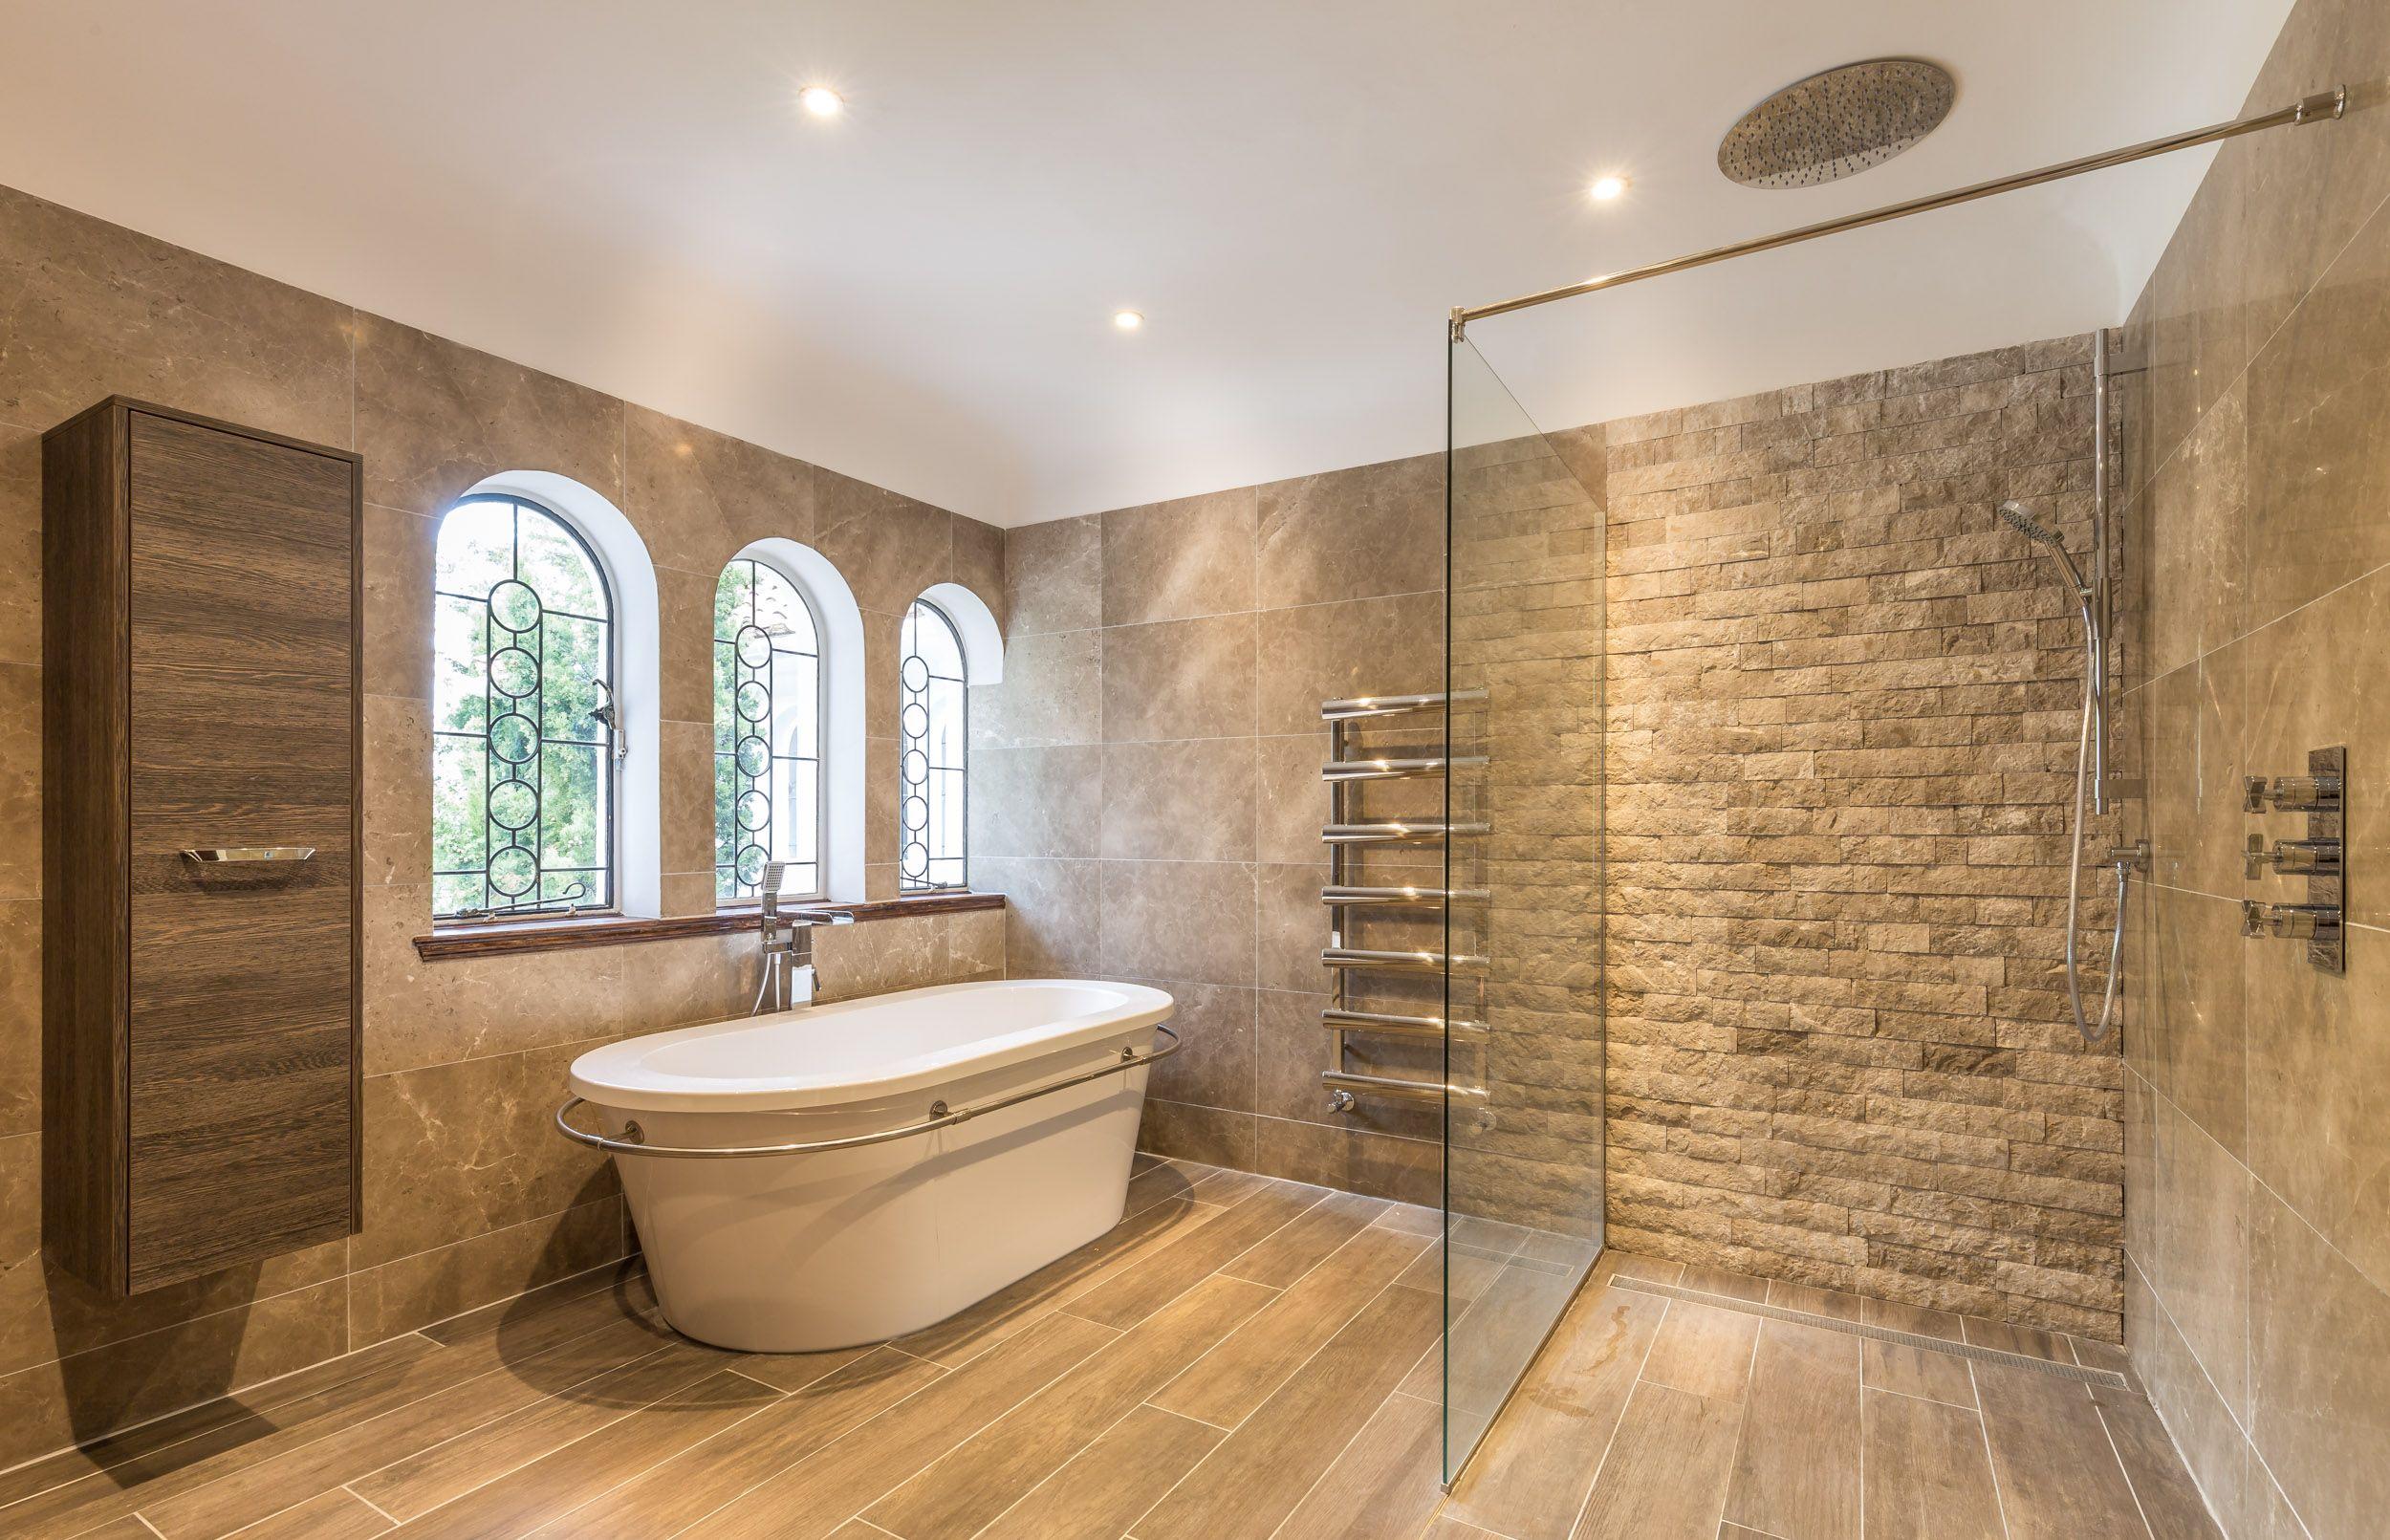 Large Contemporary Bathroom Modern Finish Rustic Stone Tile Cladding Rainmaker Shower Head Walk In Shower Modern Room Tile Walk In Shower Shower Tile